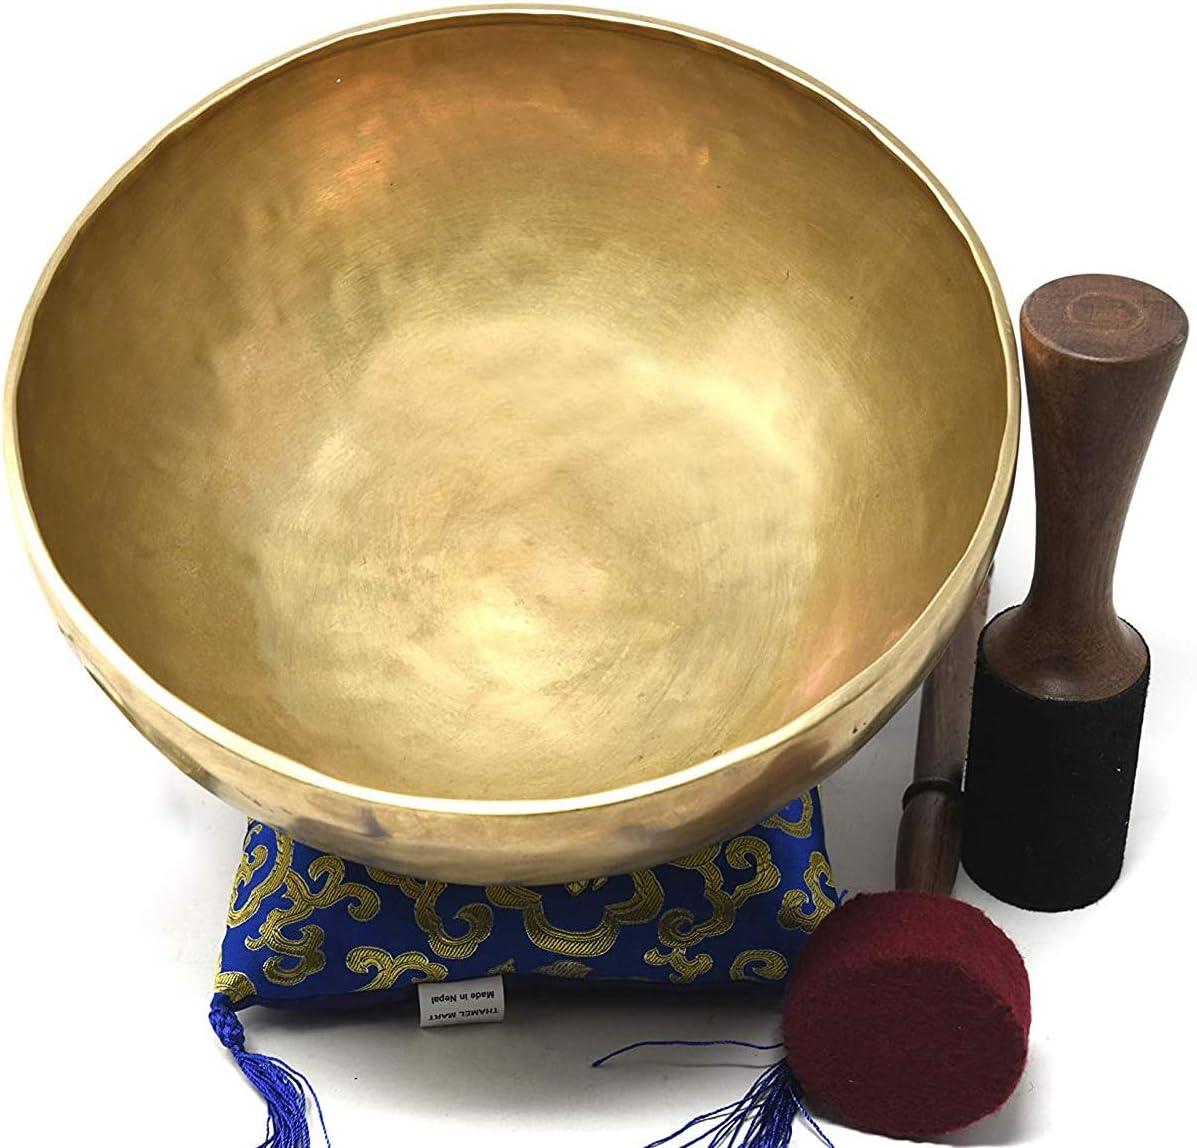 Hand Hammered Tibetan Meditation Singing Bowl 8 Inches